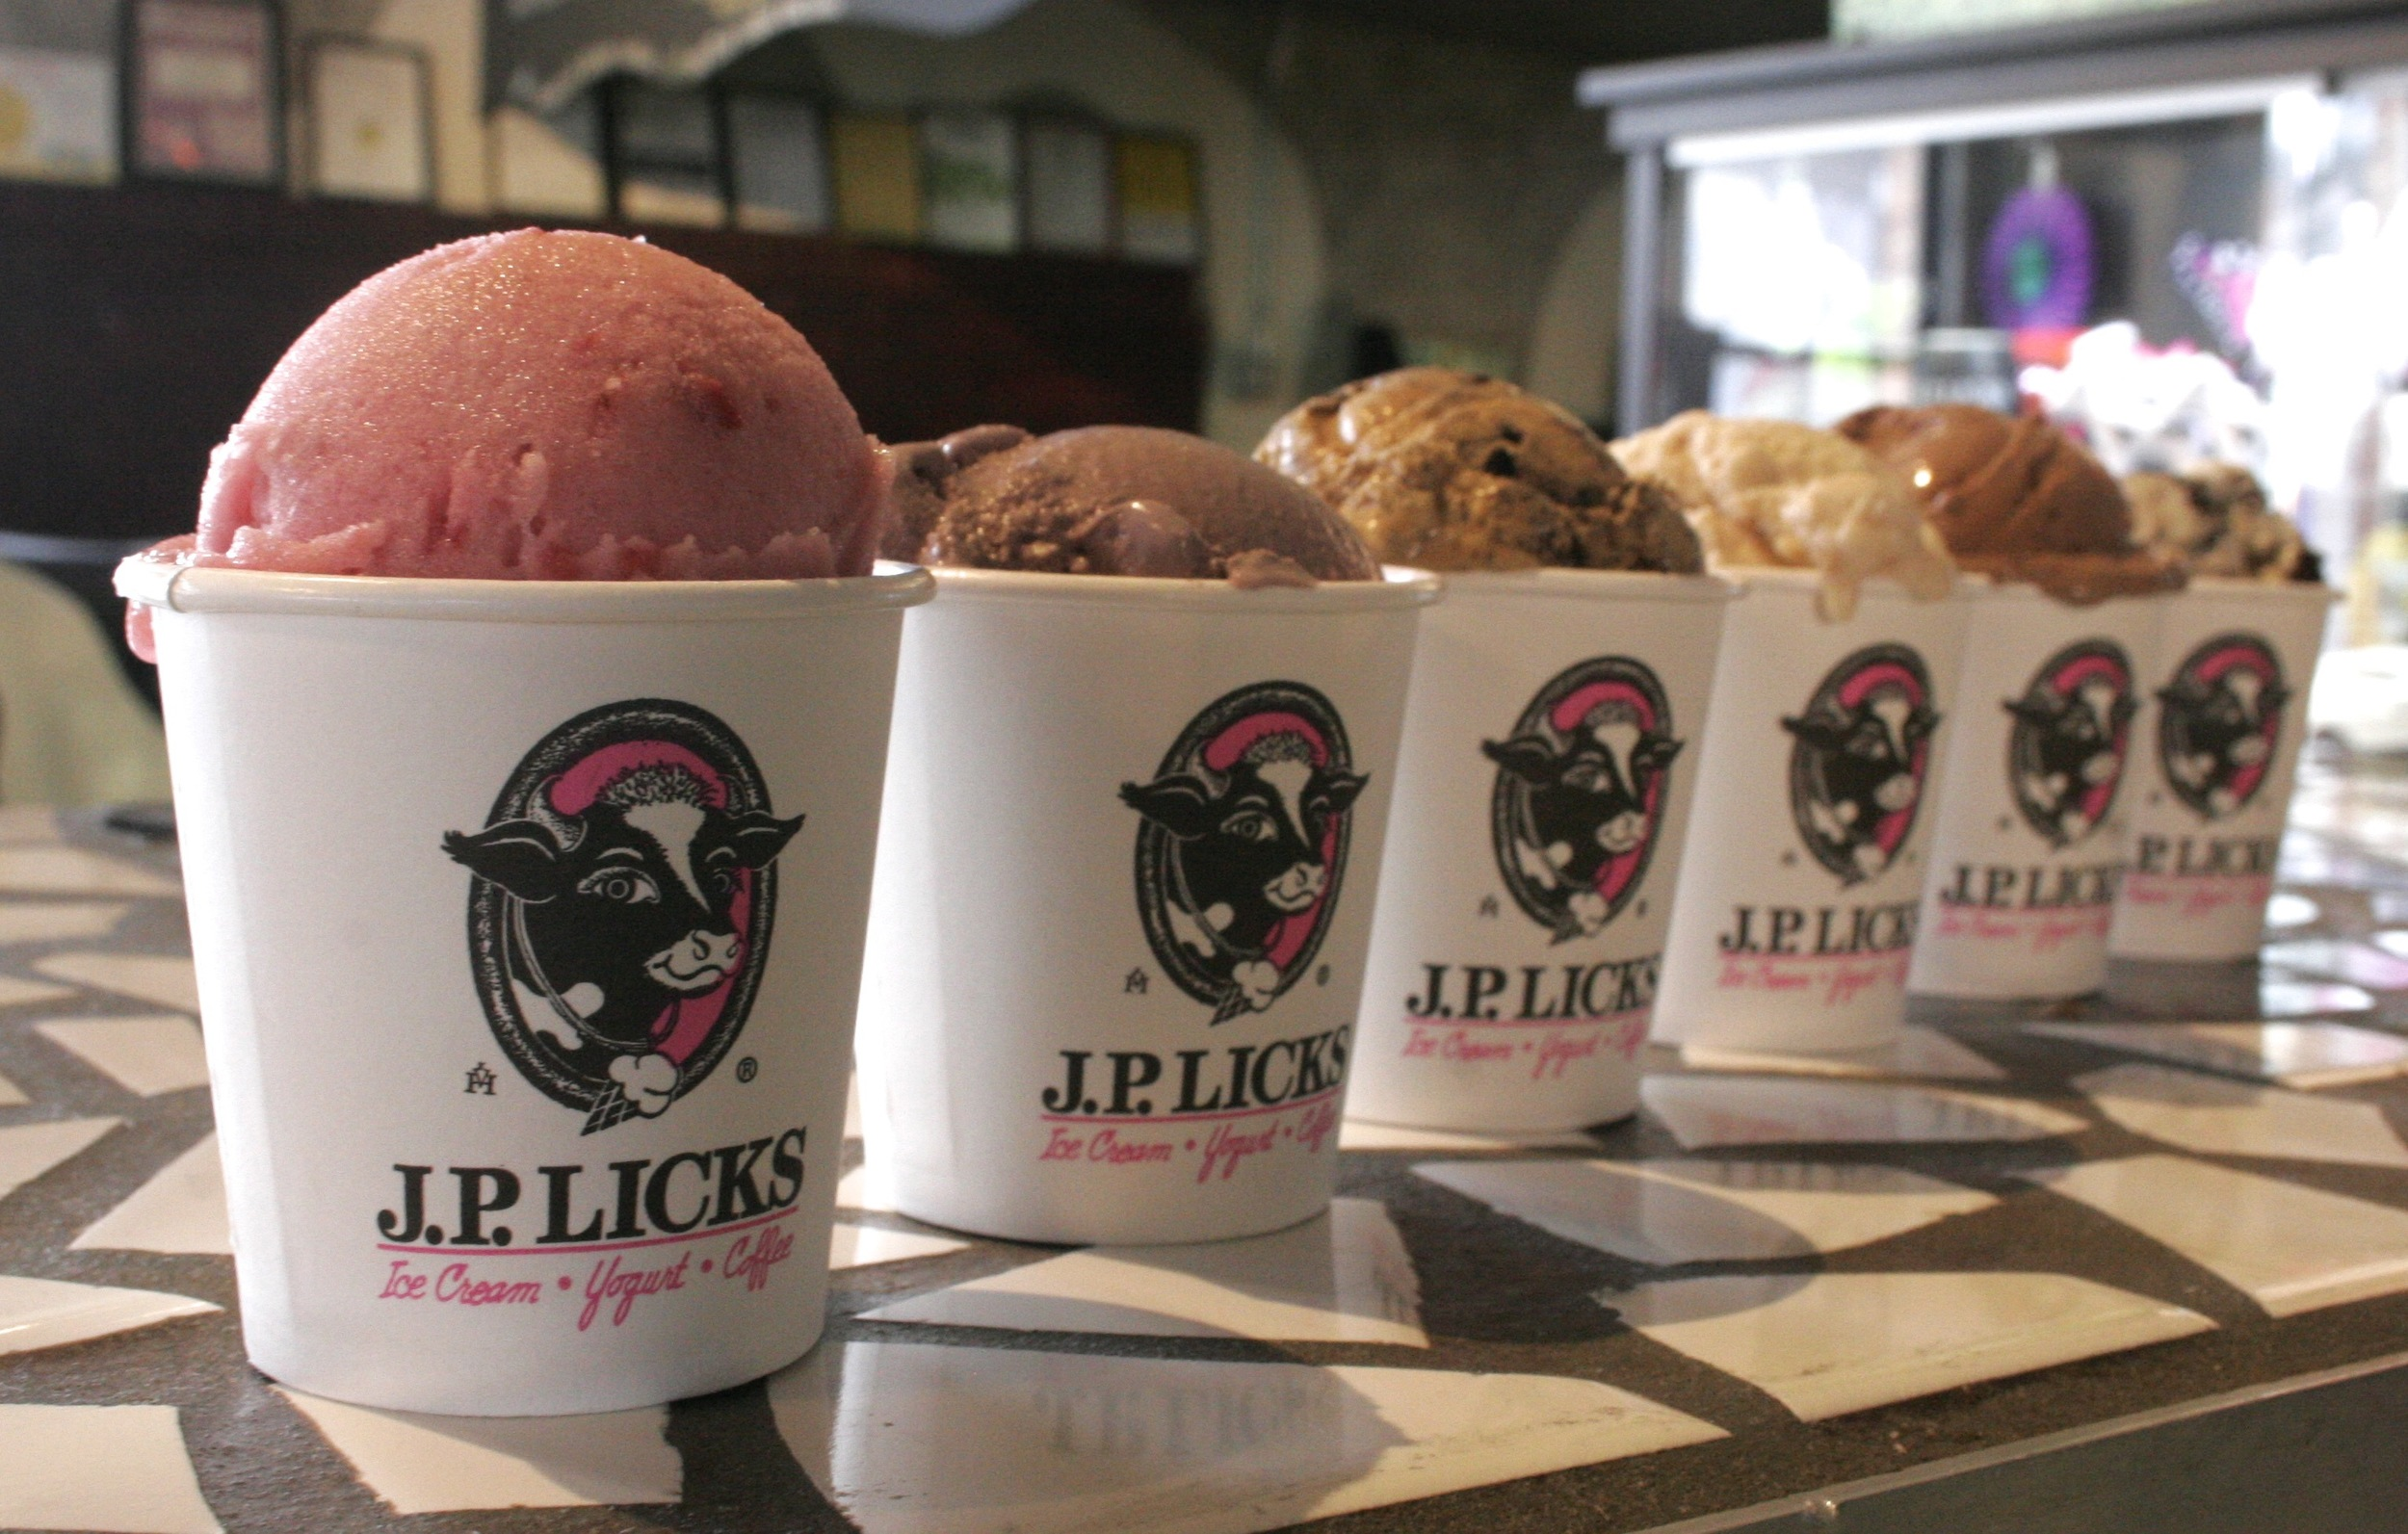 7/J.P. Licks